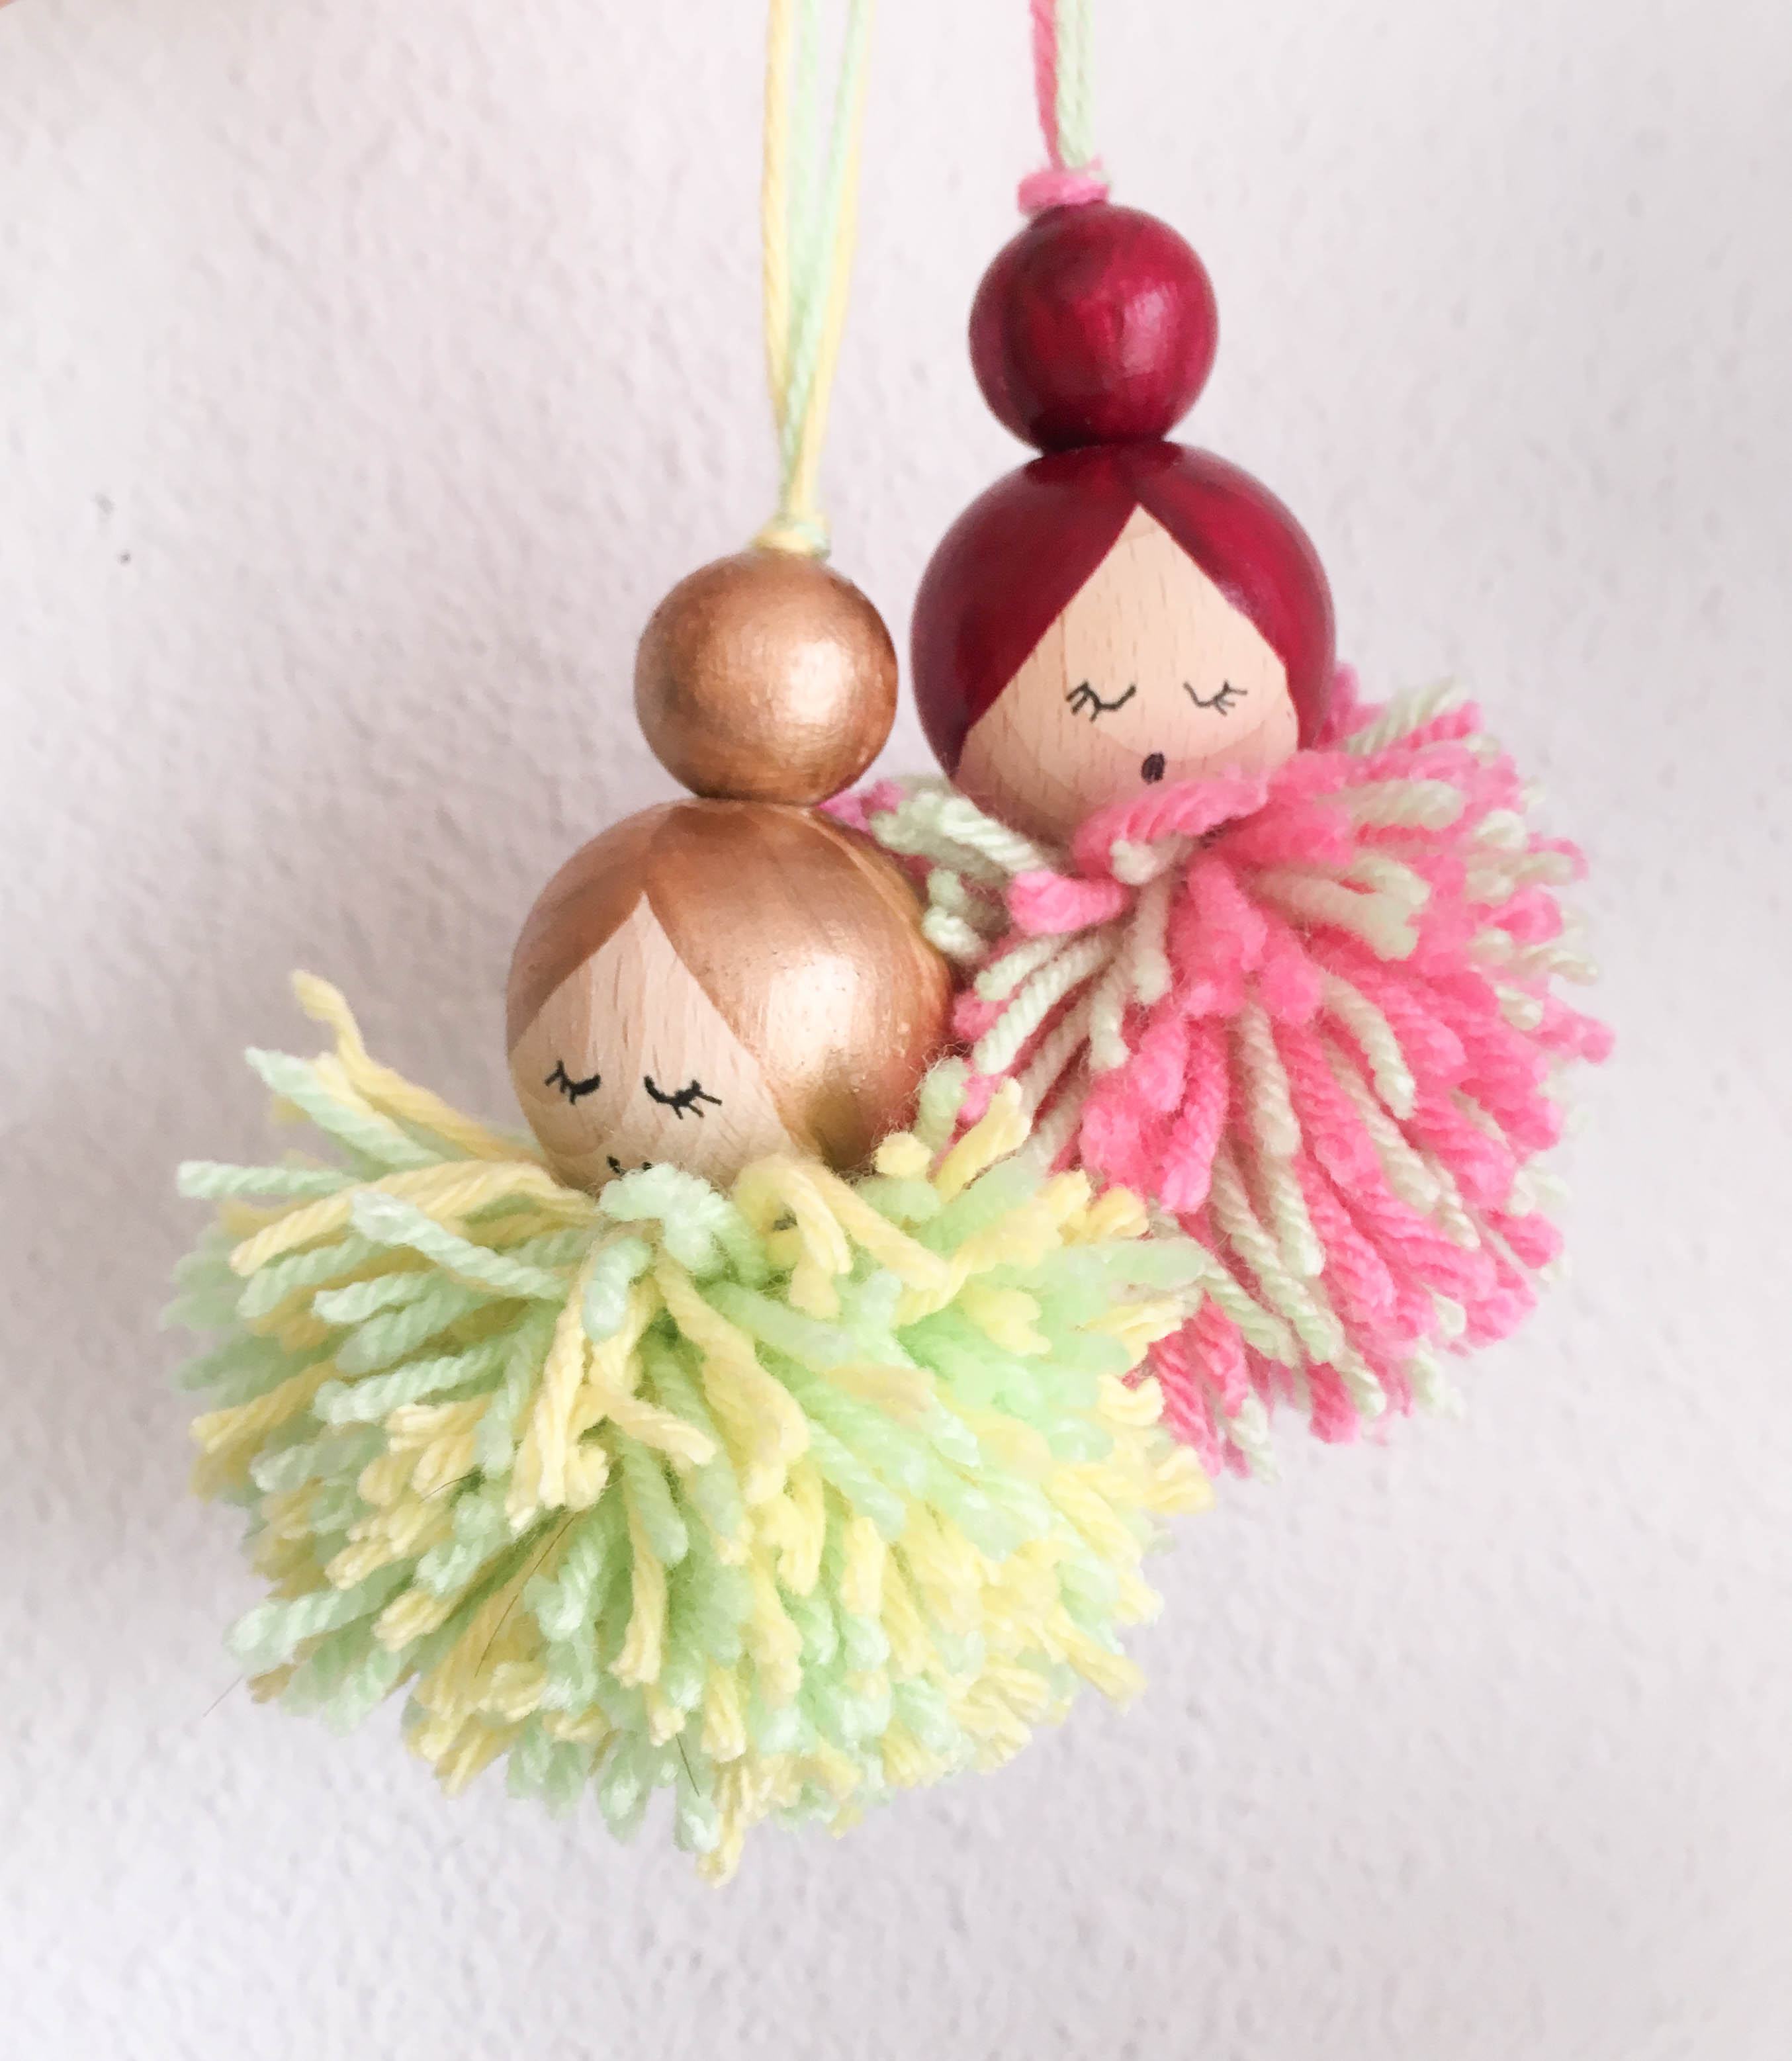 pompon poppetjes, pompoms maken, gelukspoppetjes, diy, houten kralen,